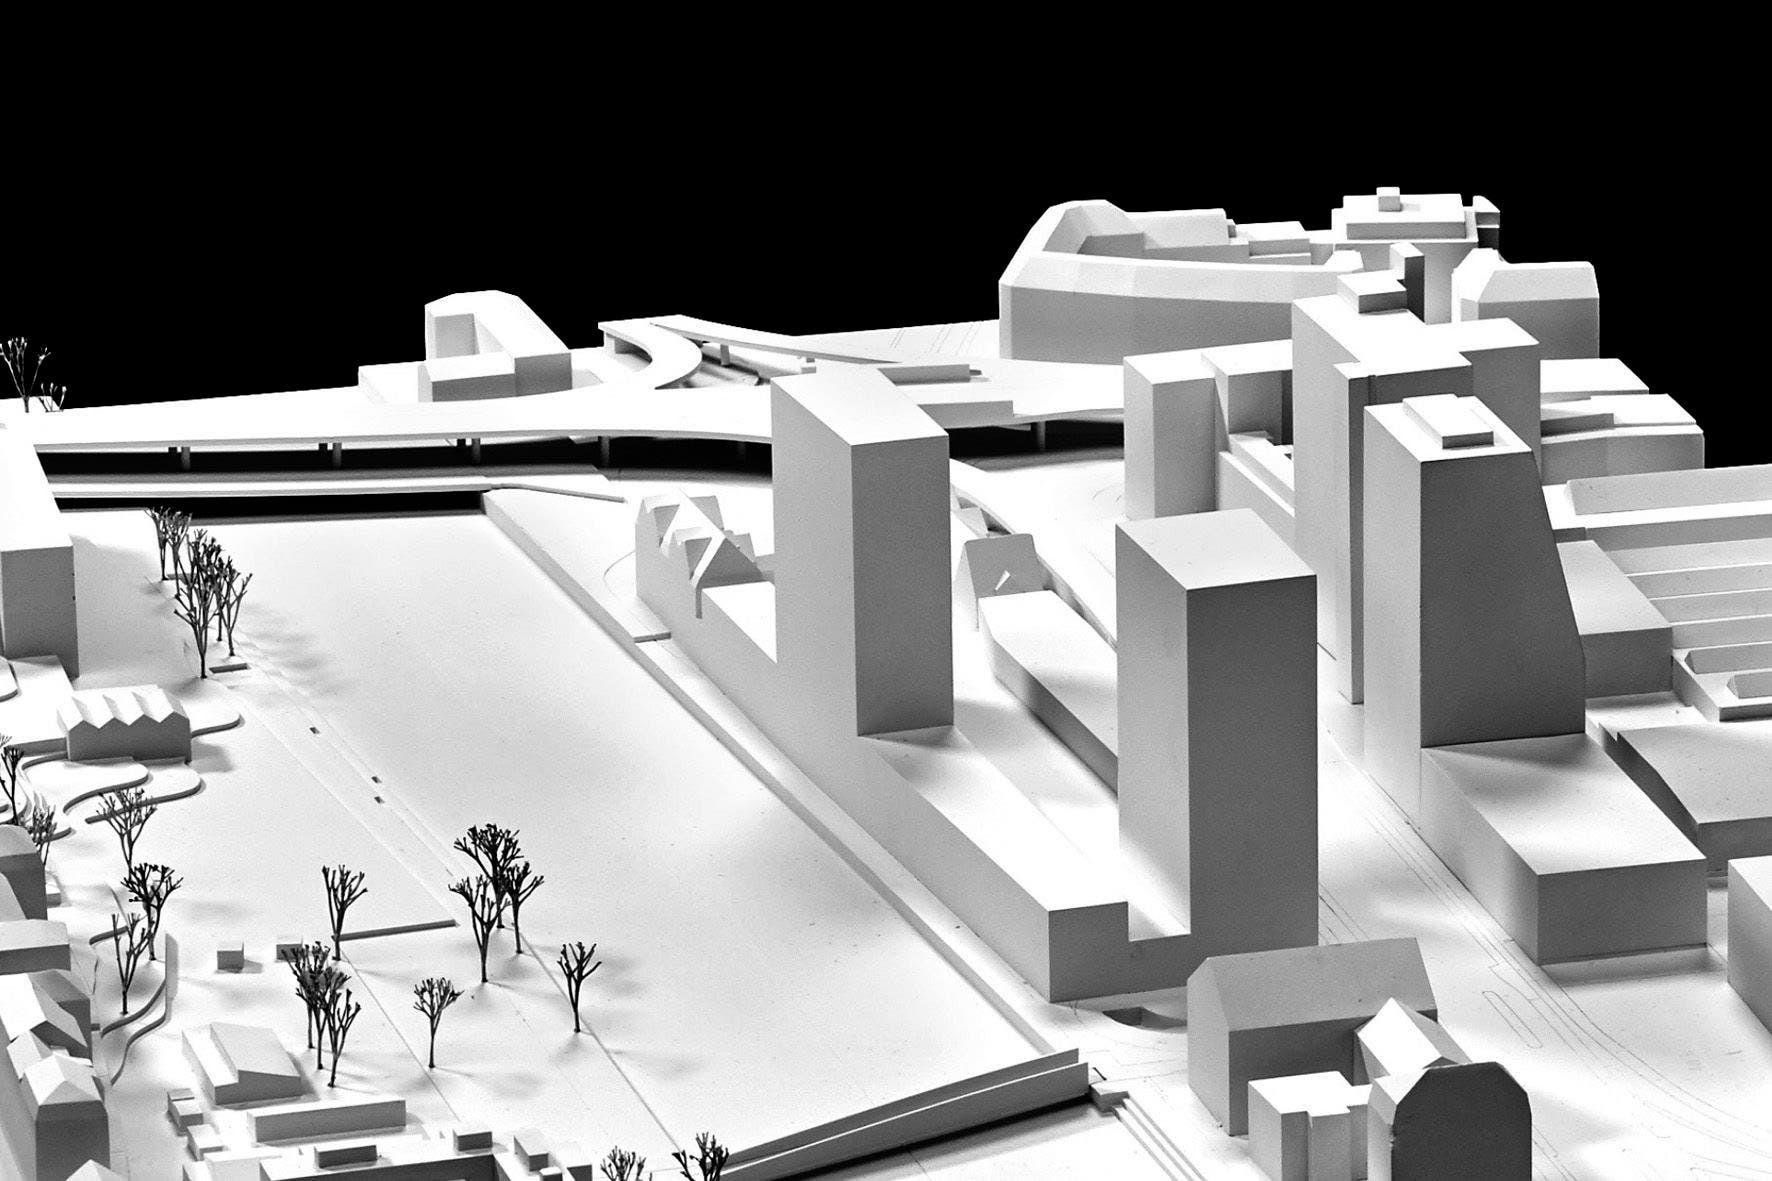 Modell des geplanten Projekts.